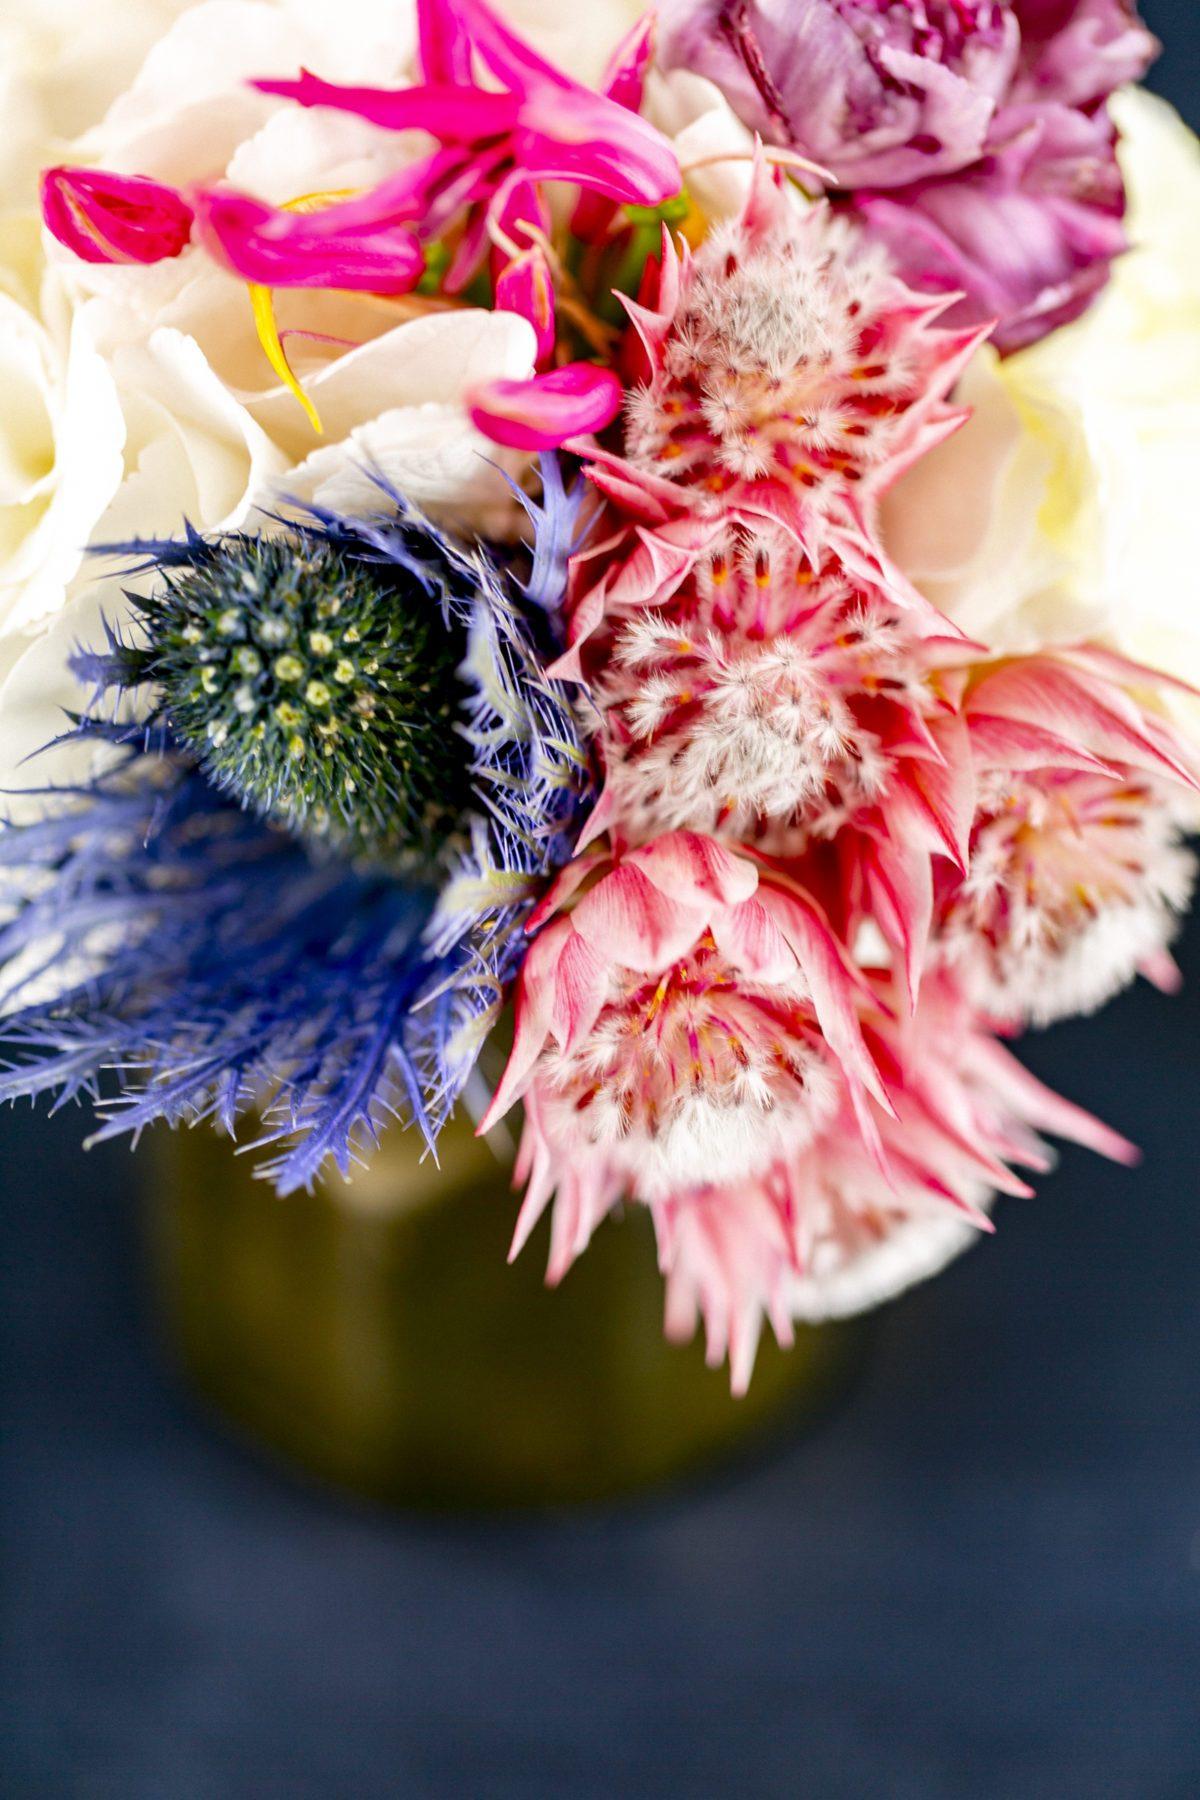 Farbenfrohe Blumengestecke